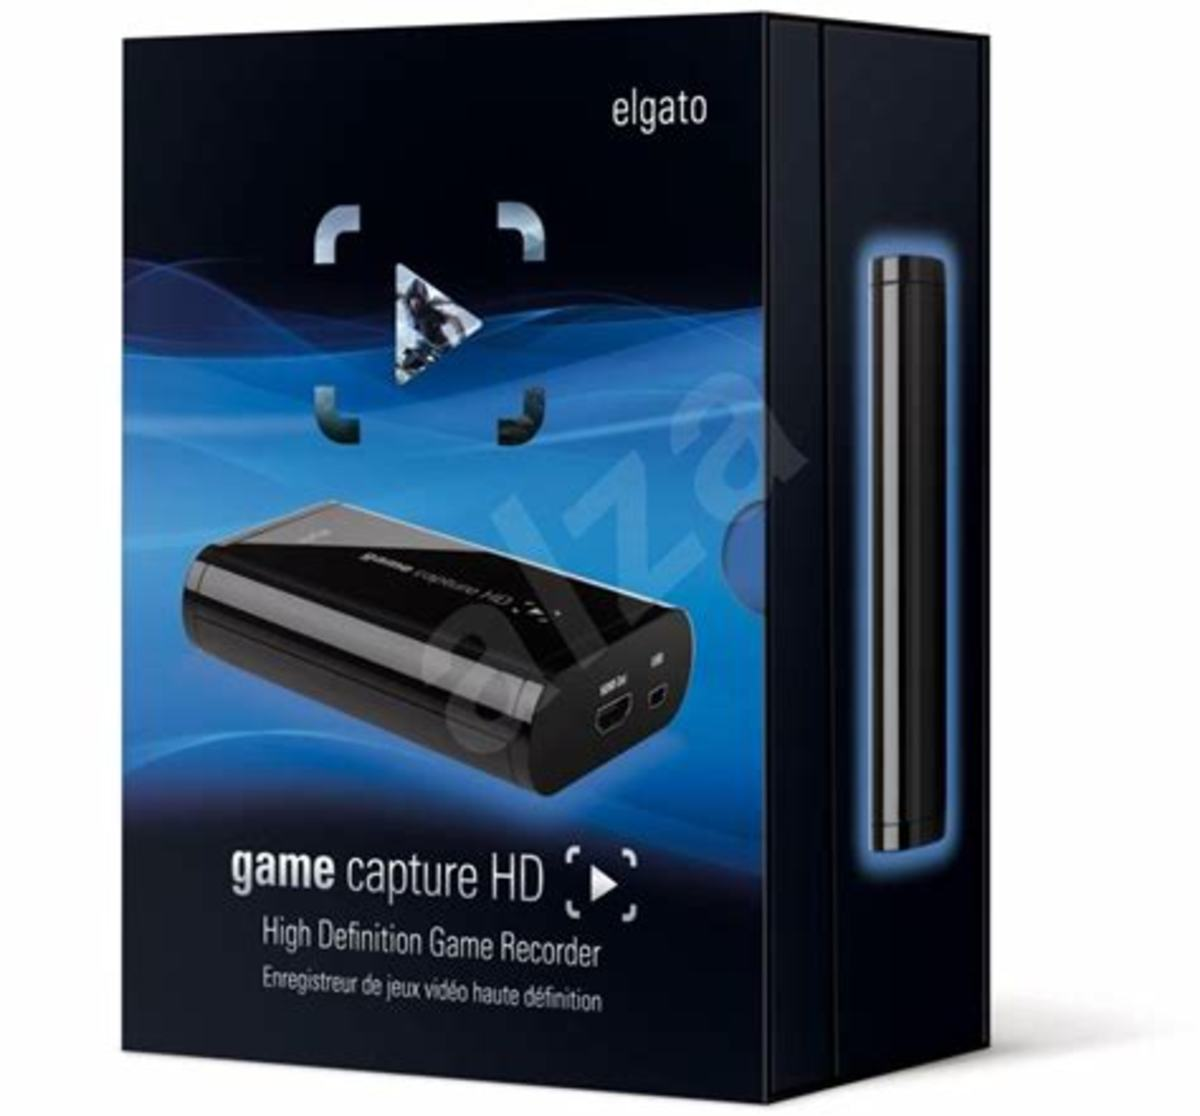 The Elgato Game Capture HD.